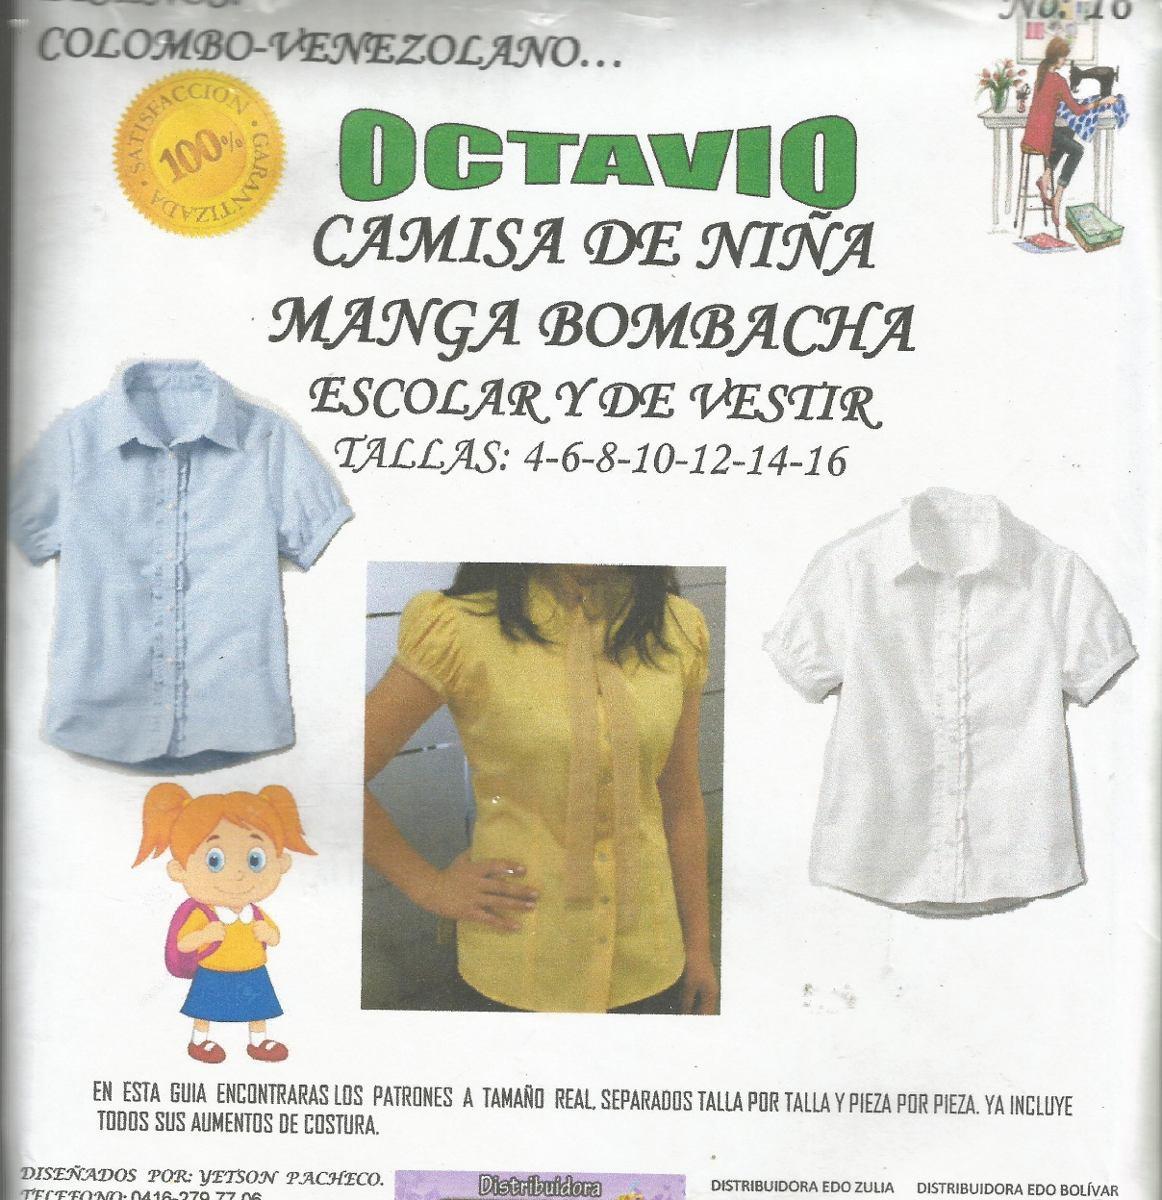 Patrones Octavio Camisa Escolar Niña Manga Bombacha - Bs. 2.499,91 ...